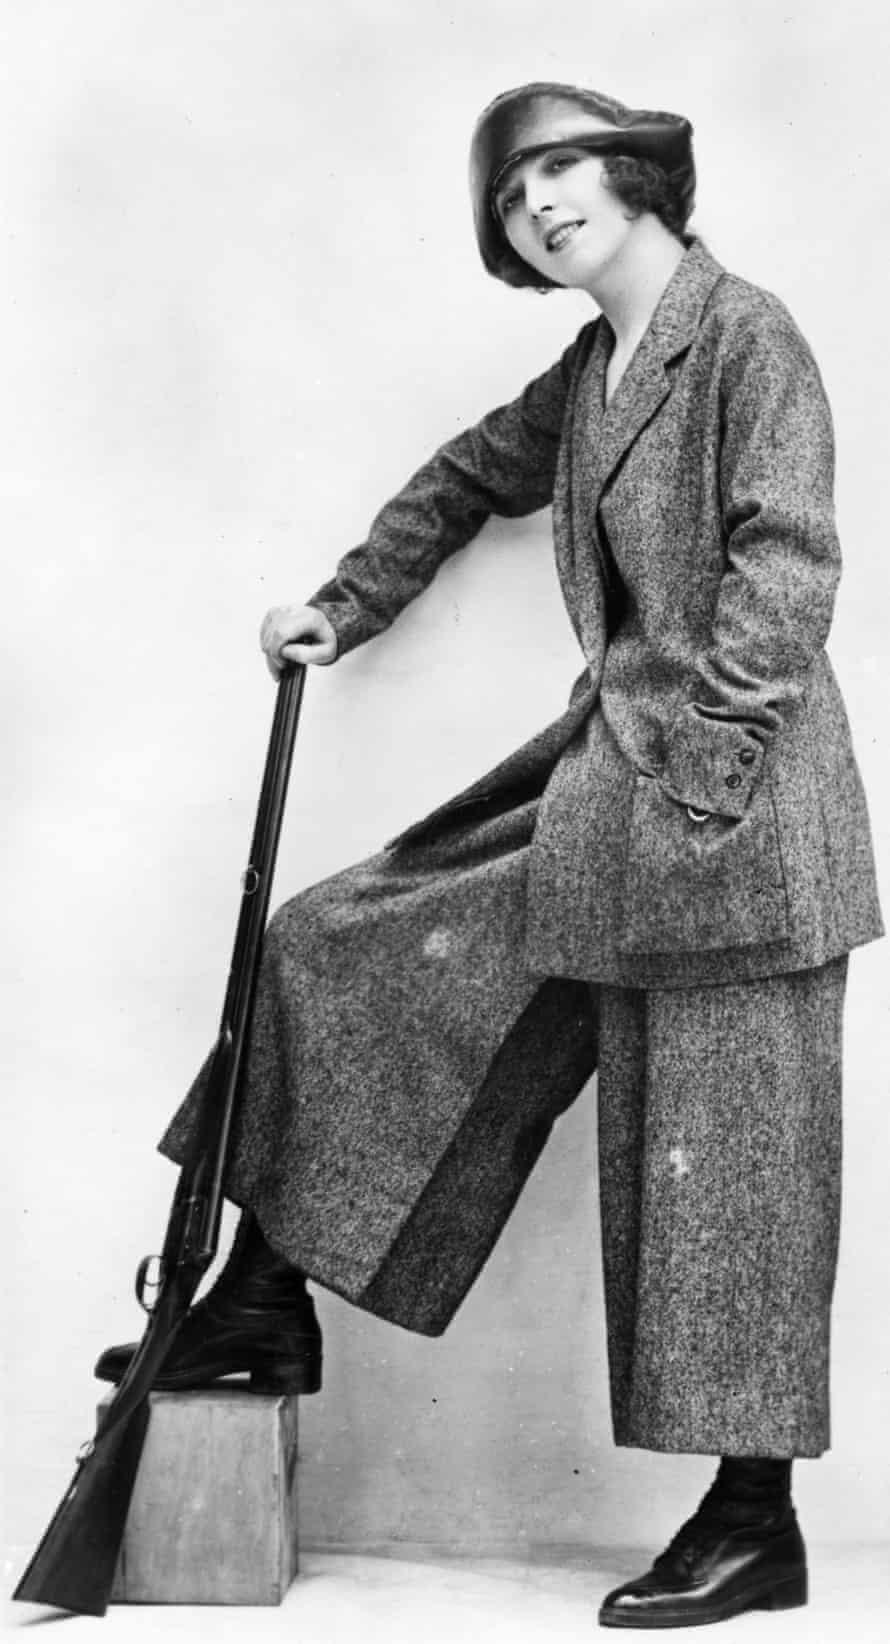 Culottes and tweed jacket